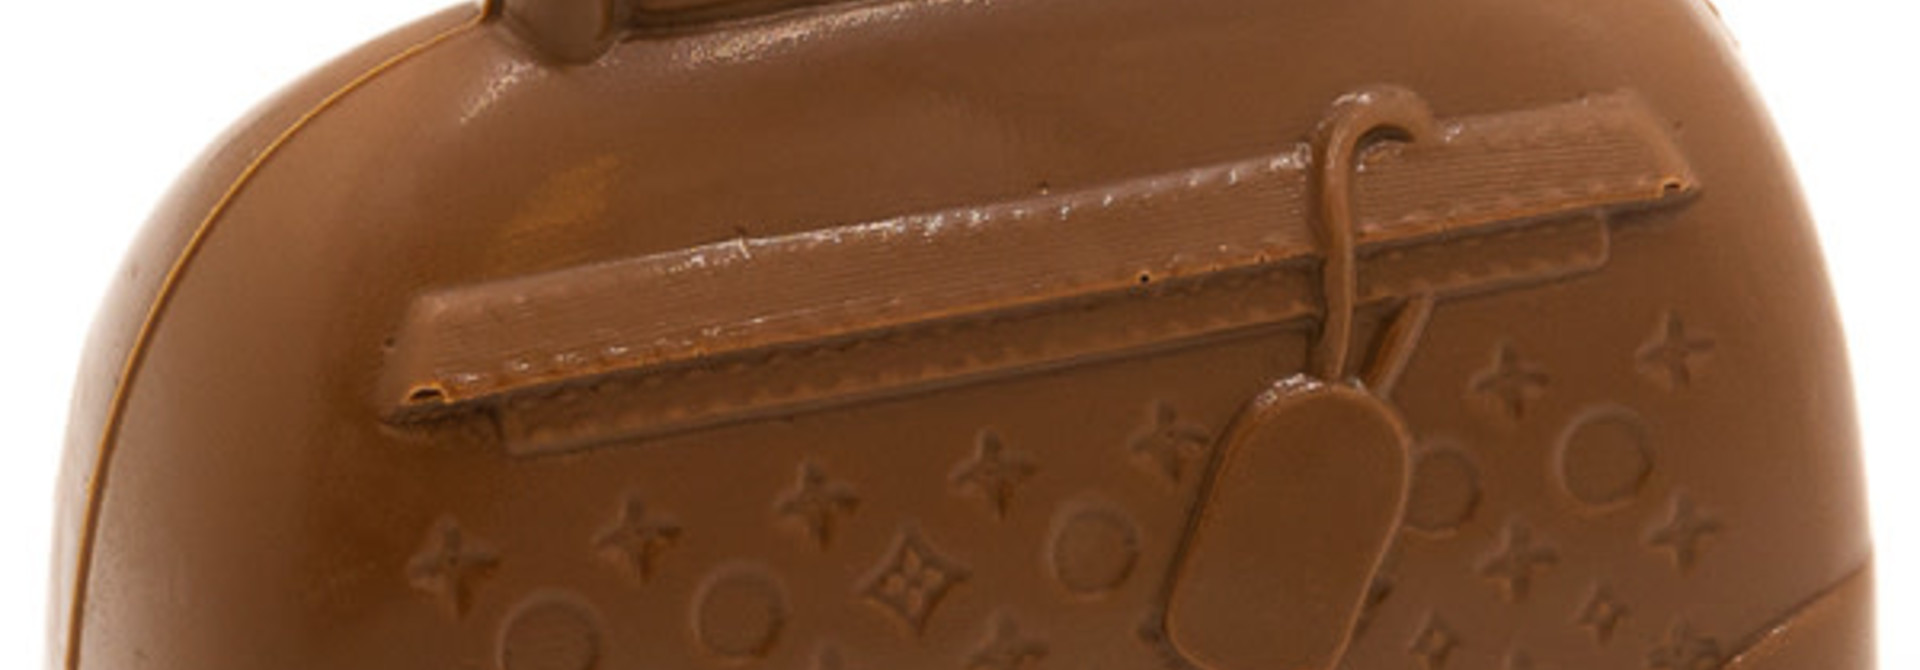 Luxury chocolate bag (milk)